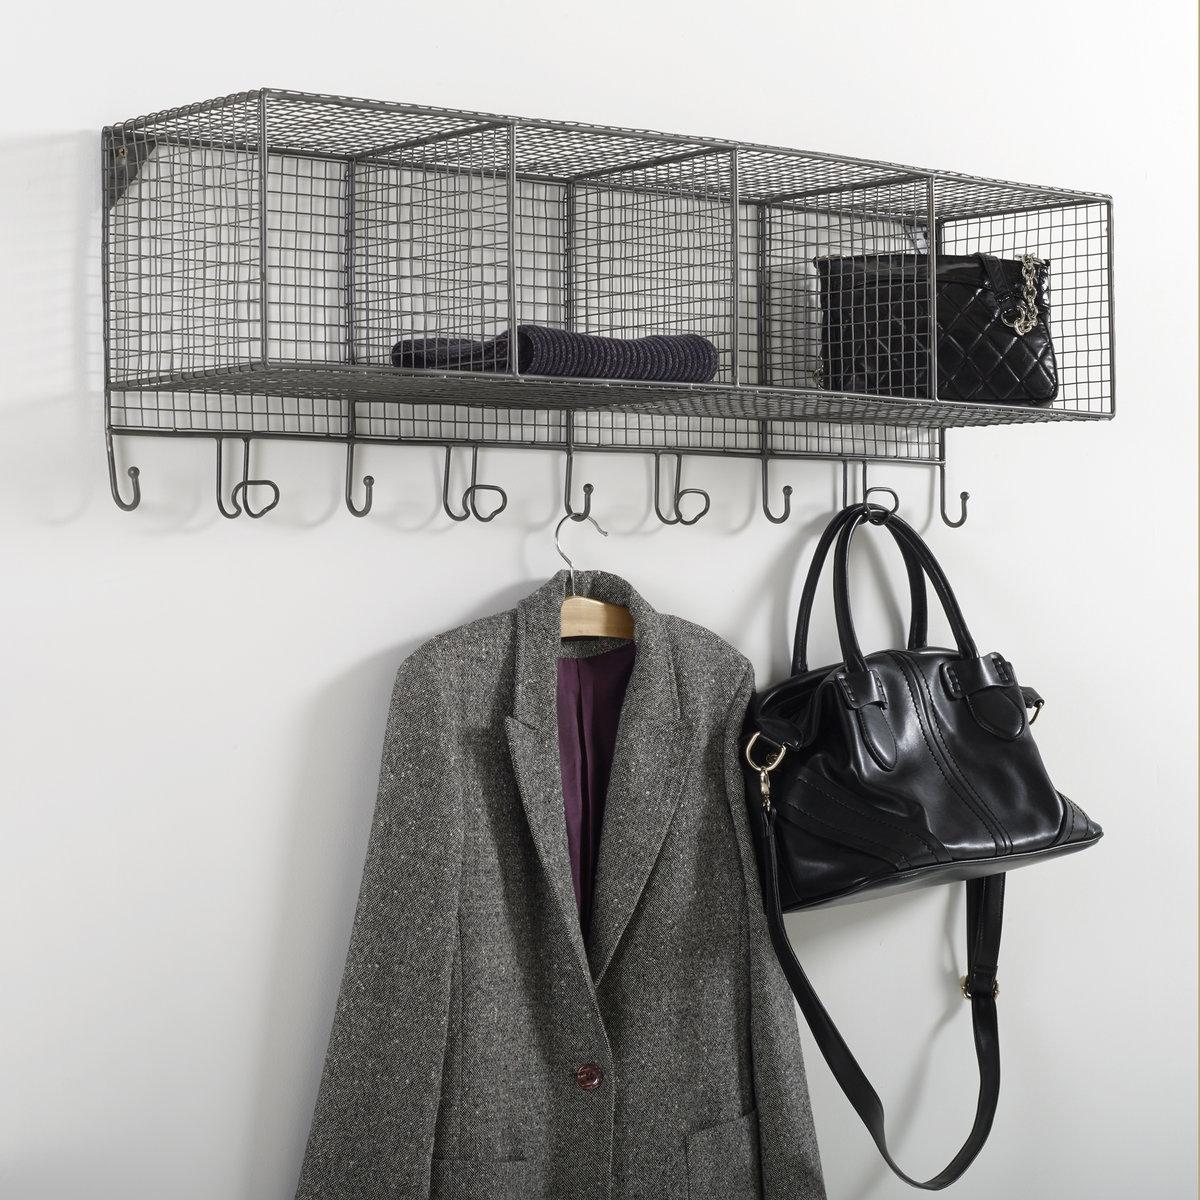 Вешалка-этажерка из металлической проволоки Areglo